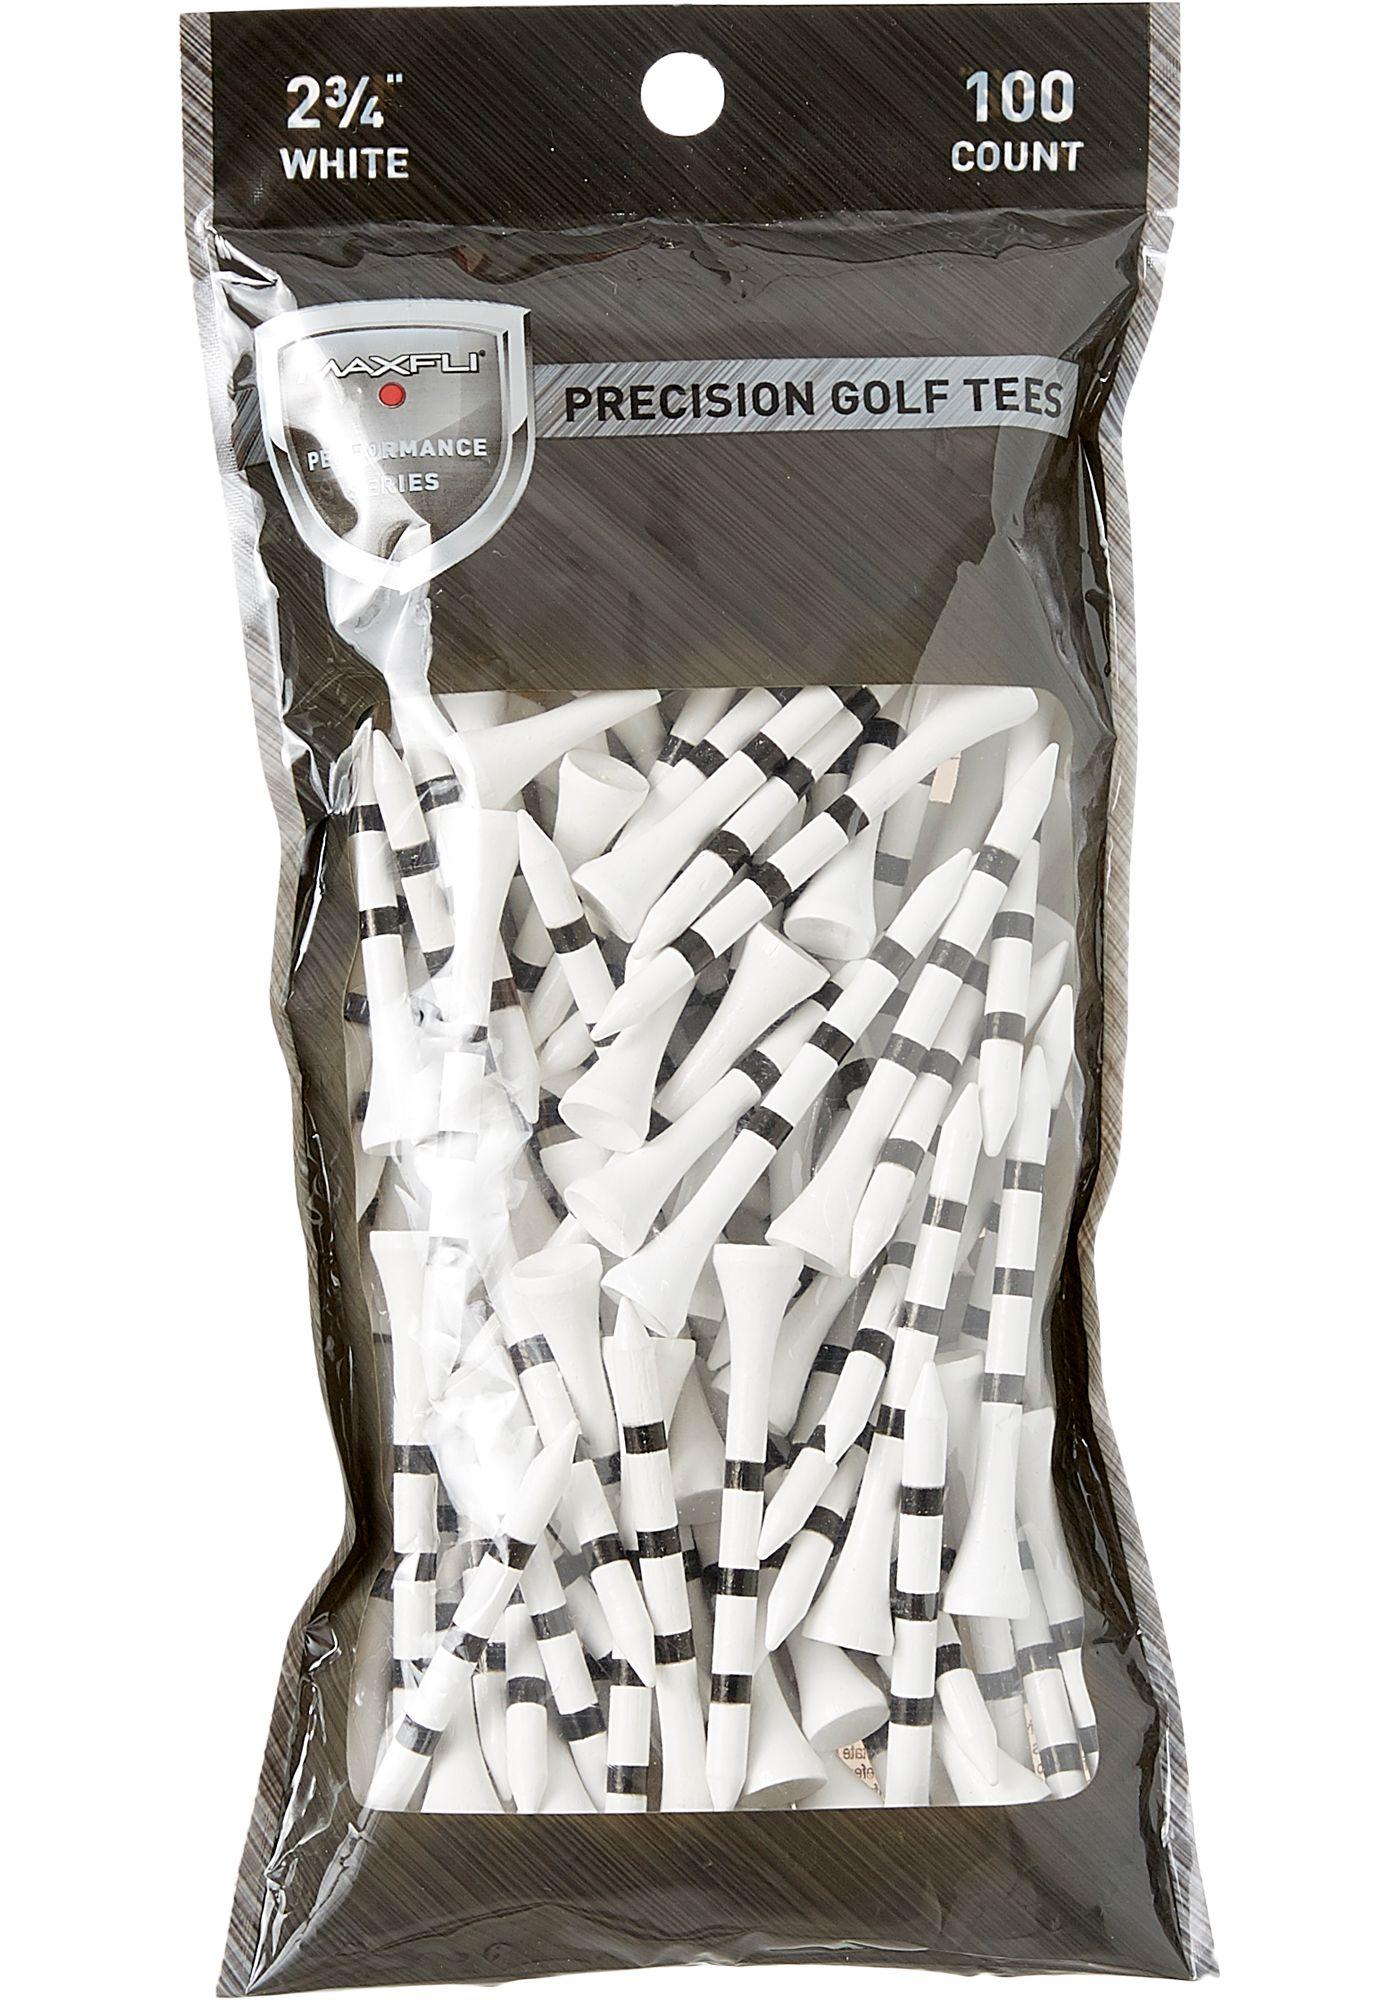 "Maxfli 2.75"" Performance Series Precision Golf Tees - 100-Pack"